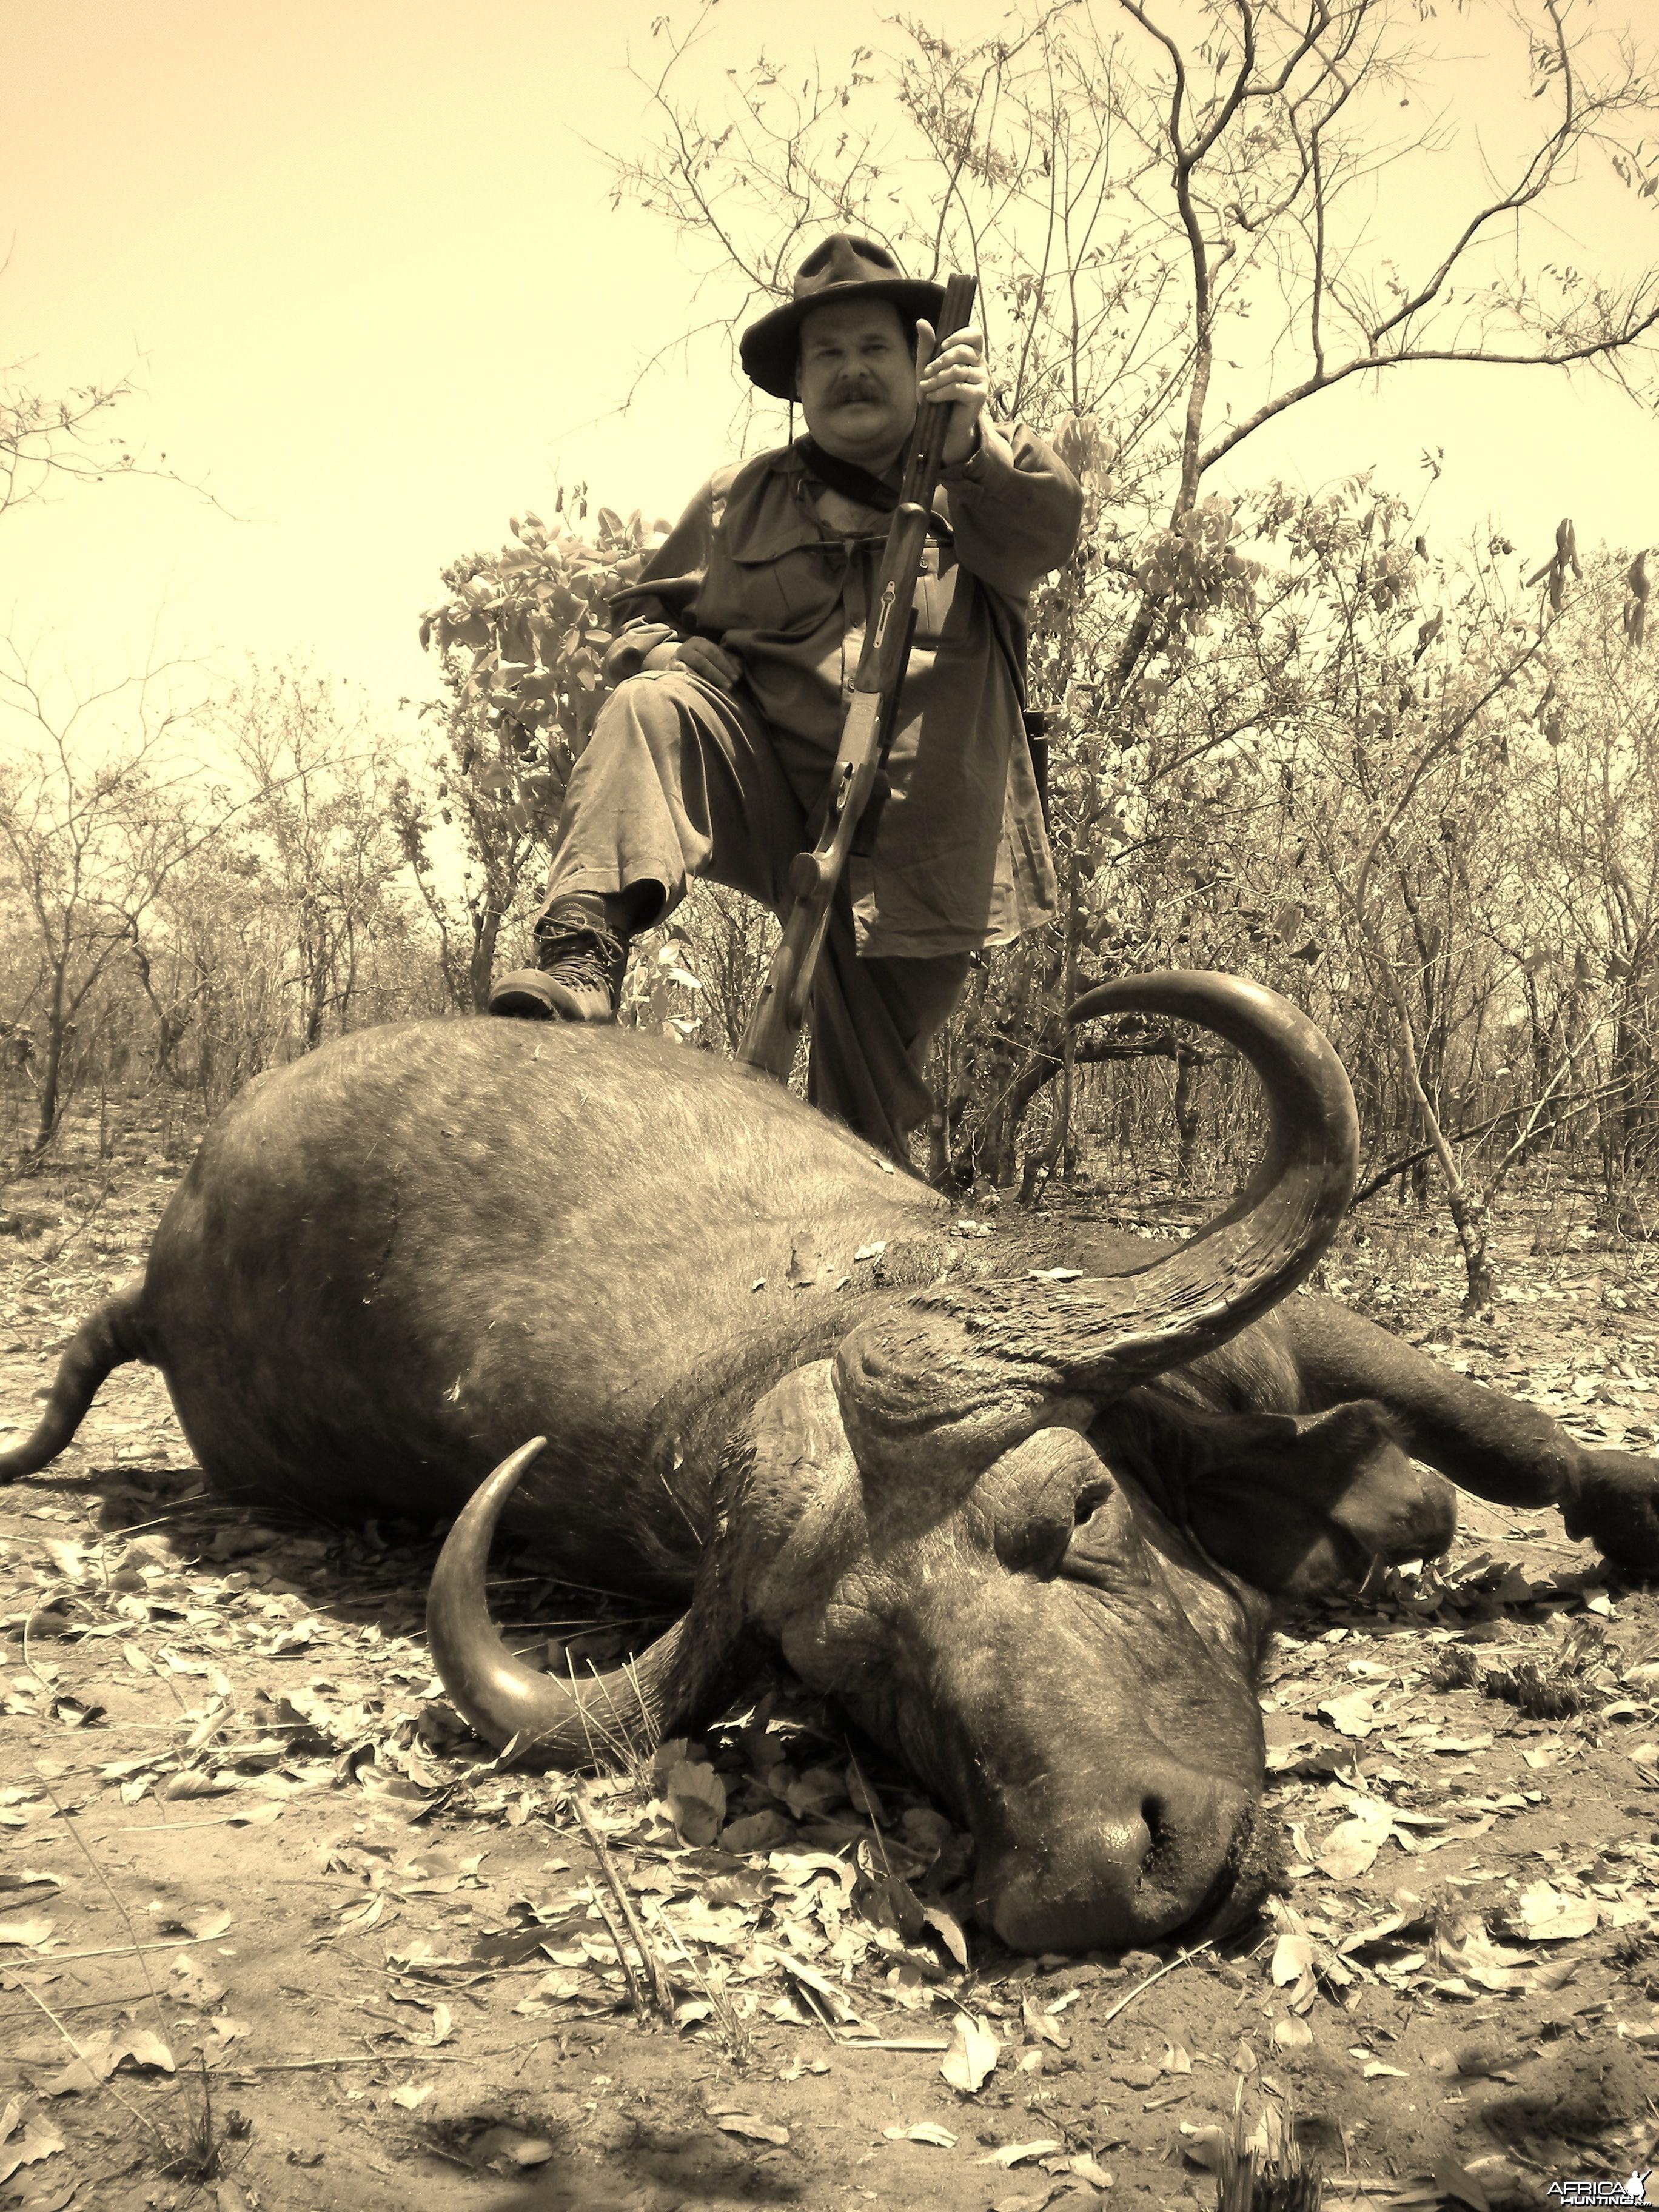 Buffalo shot two days ago in Zimbabwe